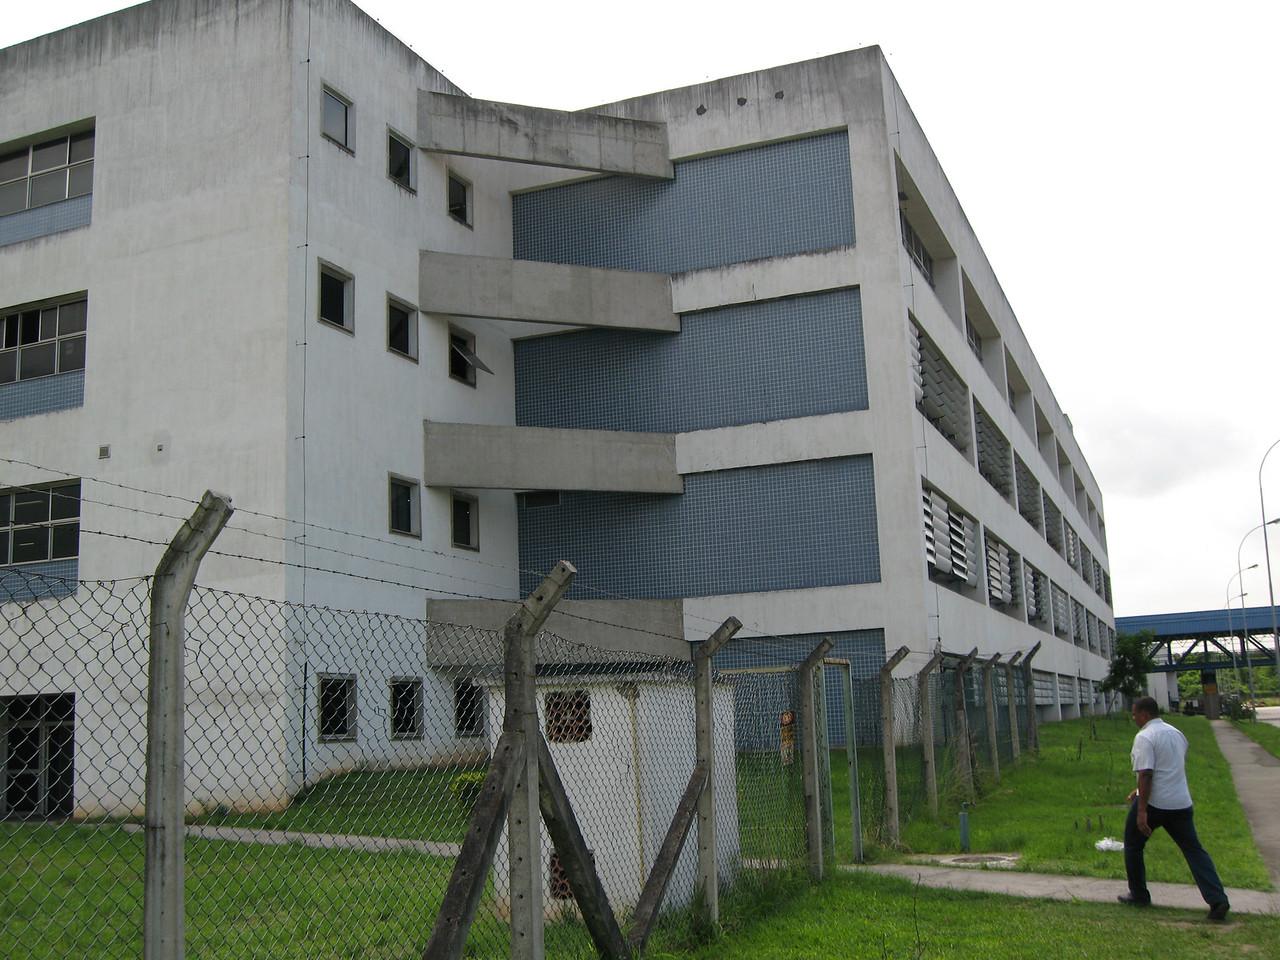 2007-01-31_009